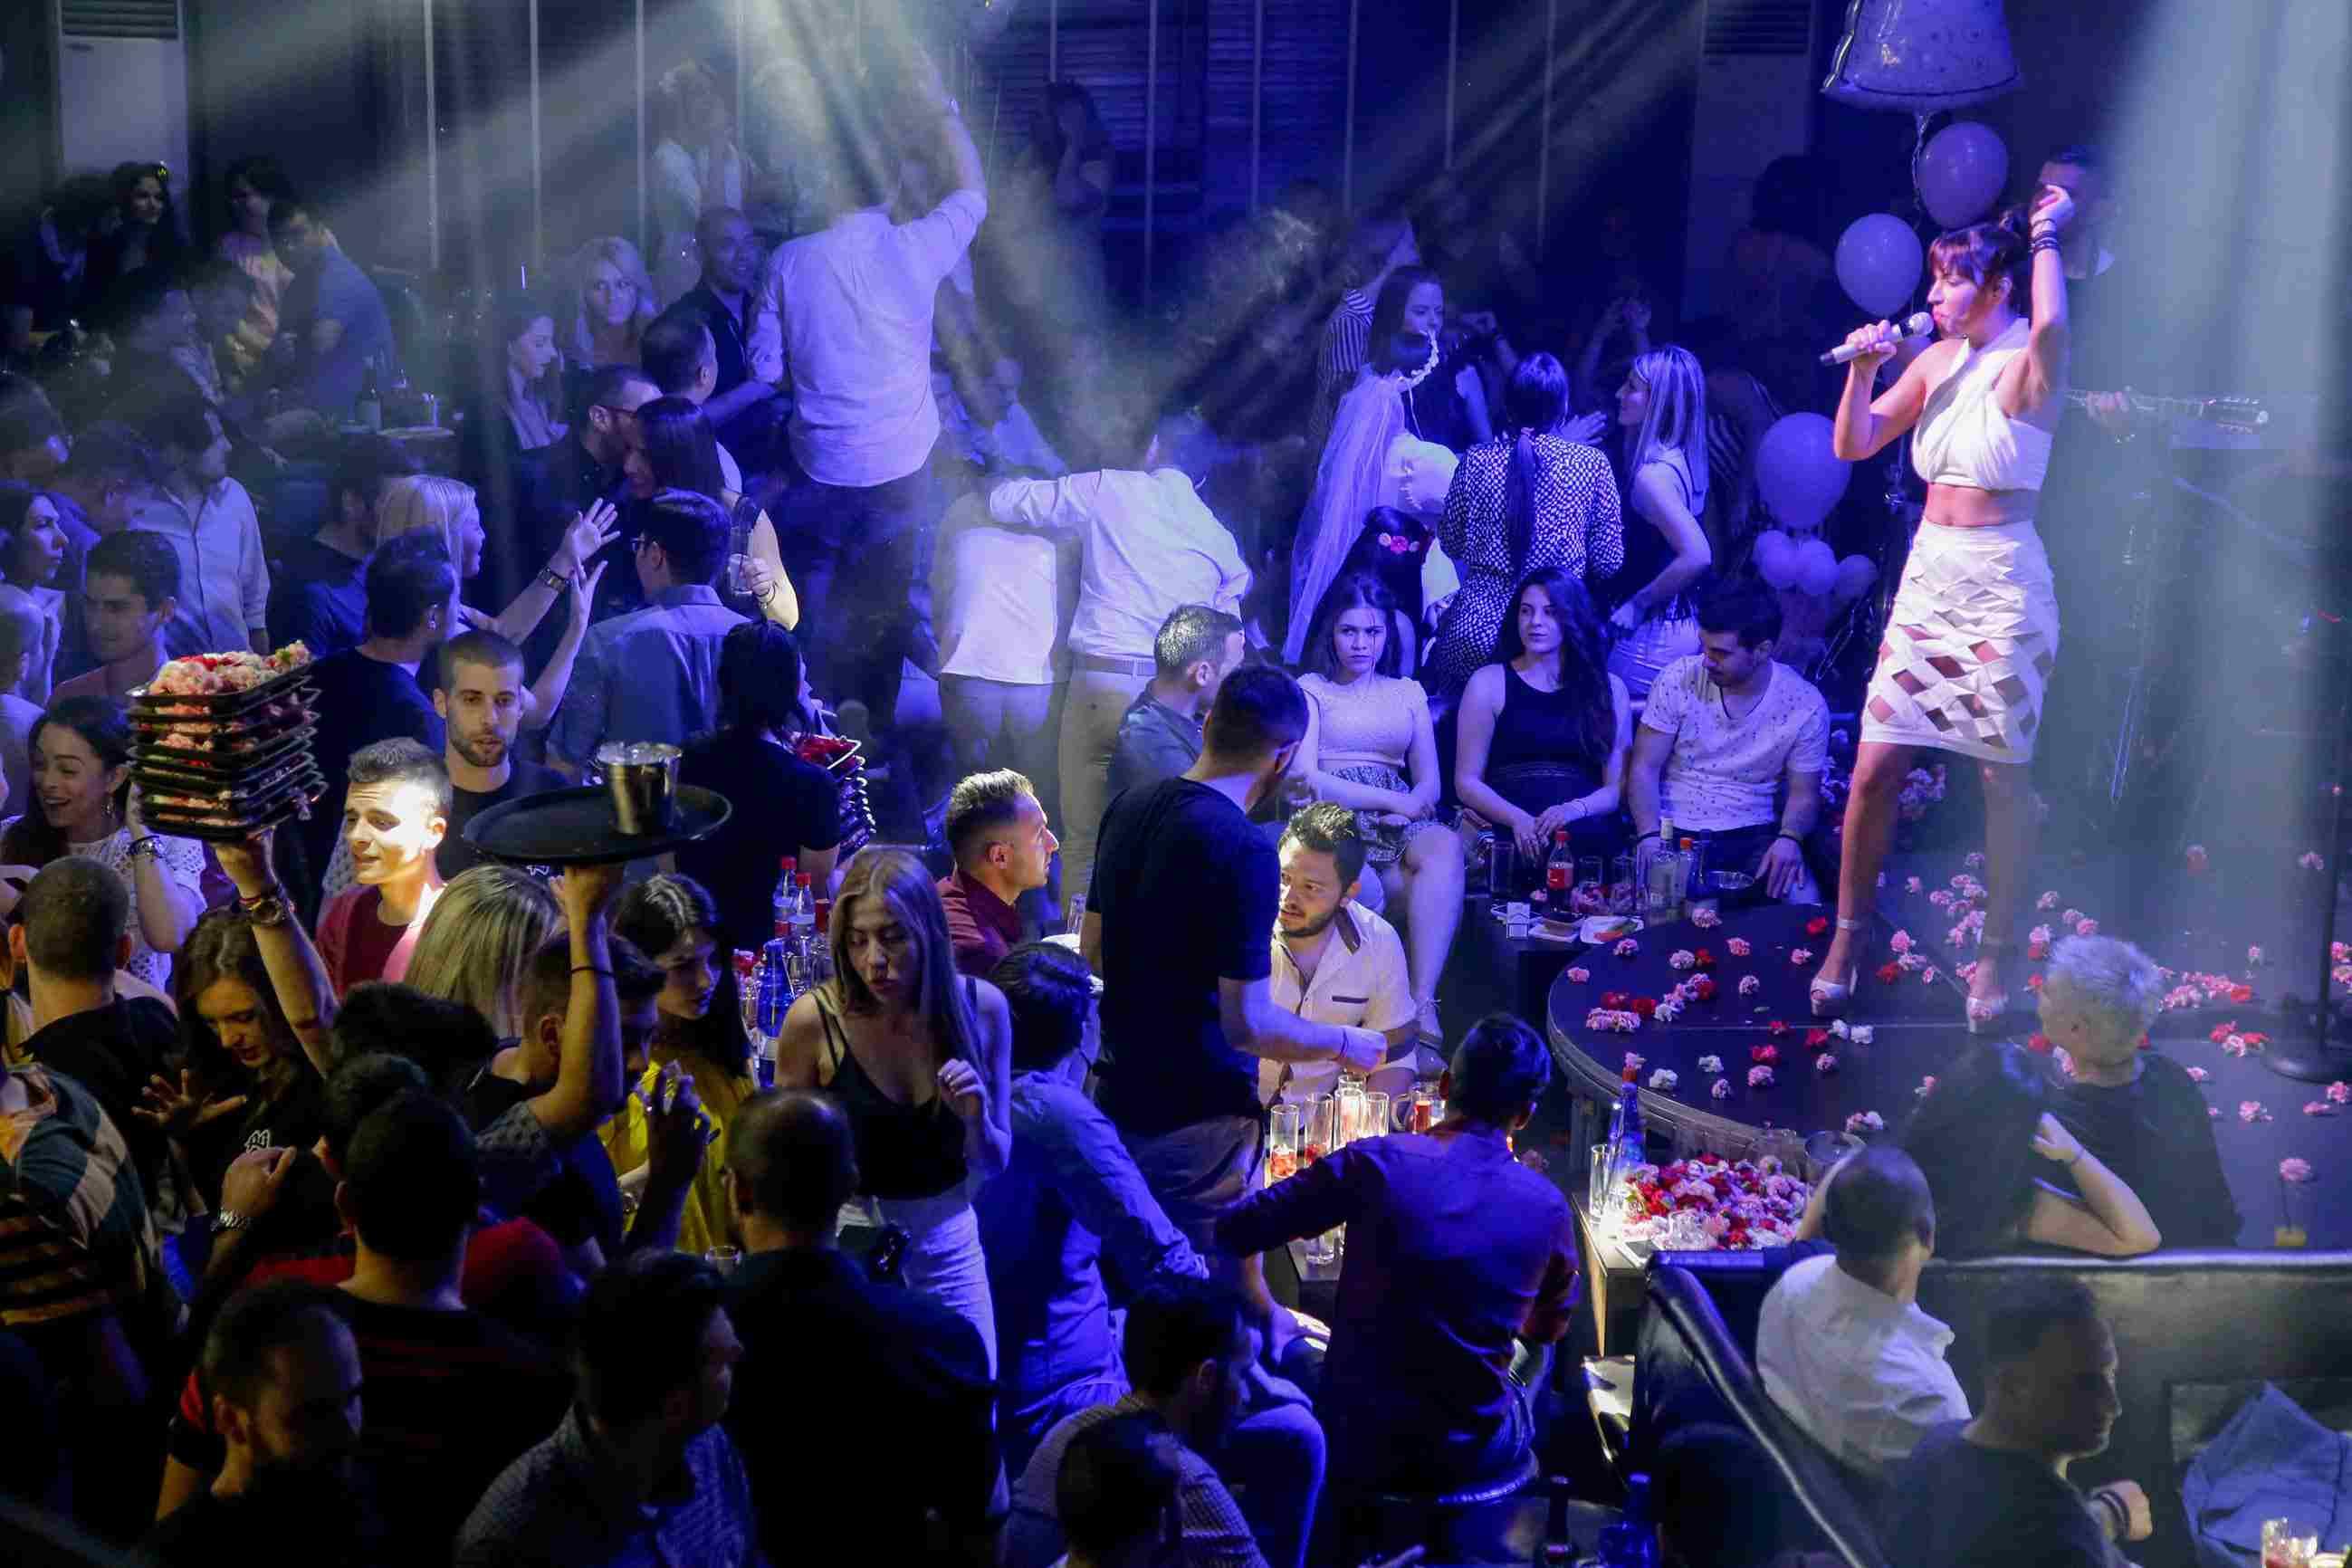 Thessalonika Nightclubs in Port, Valouritou and Ladadika are lively